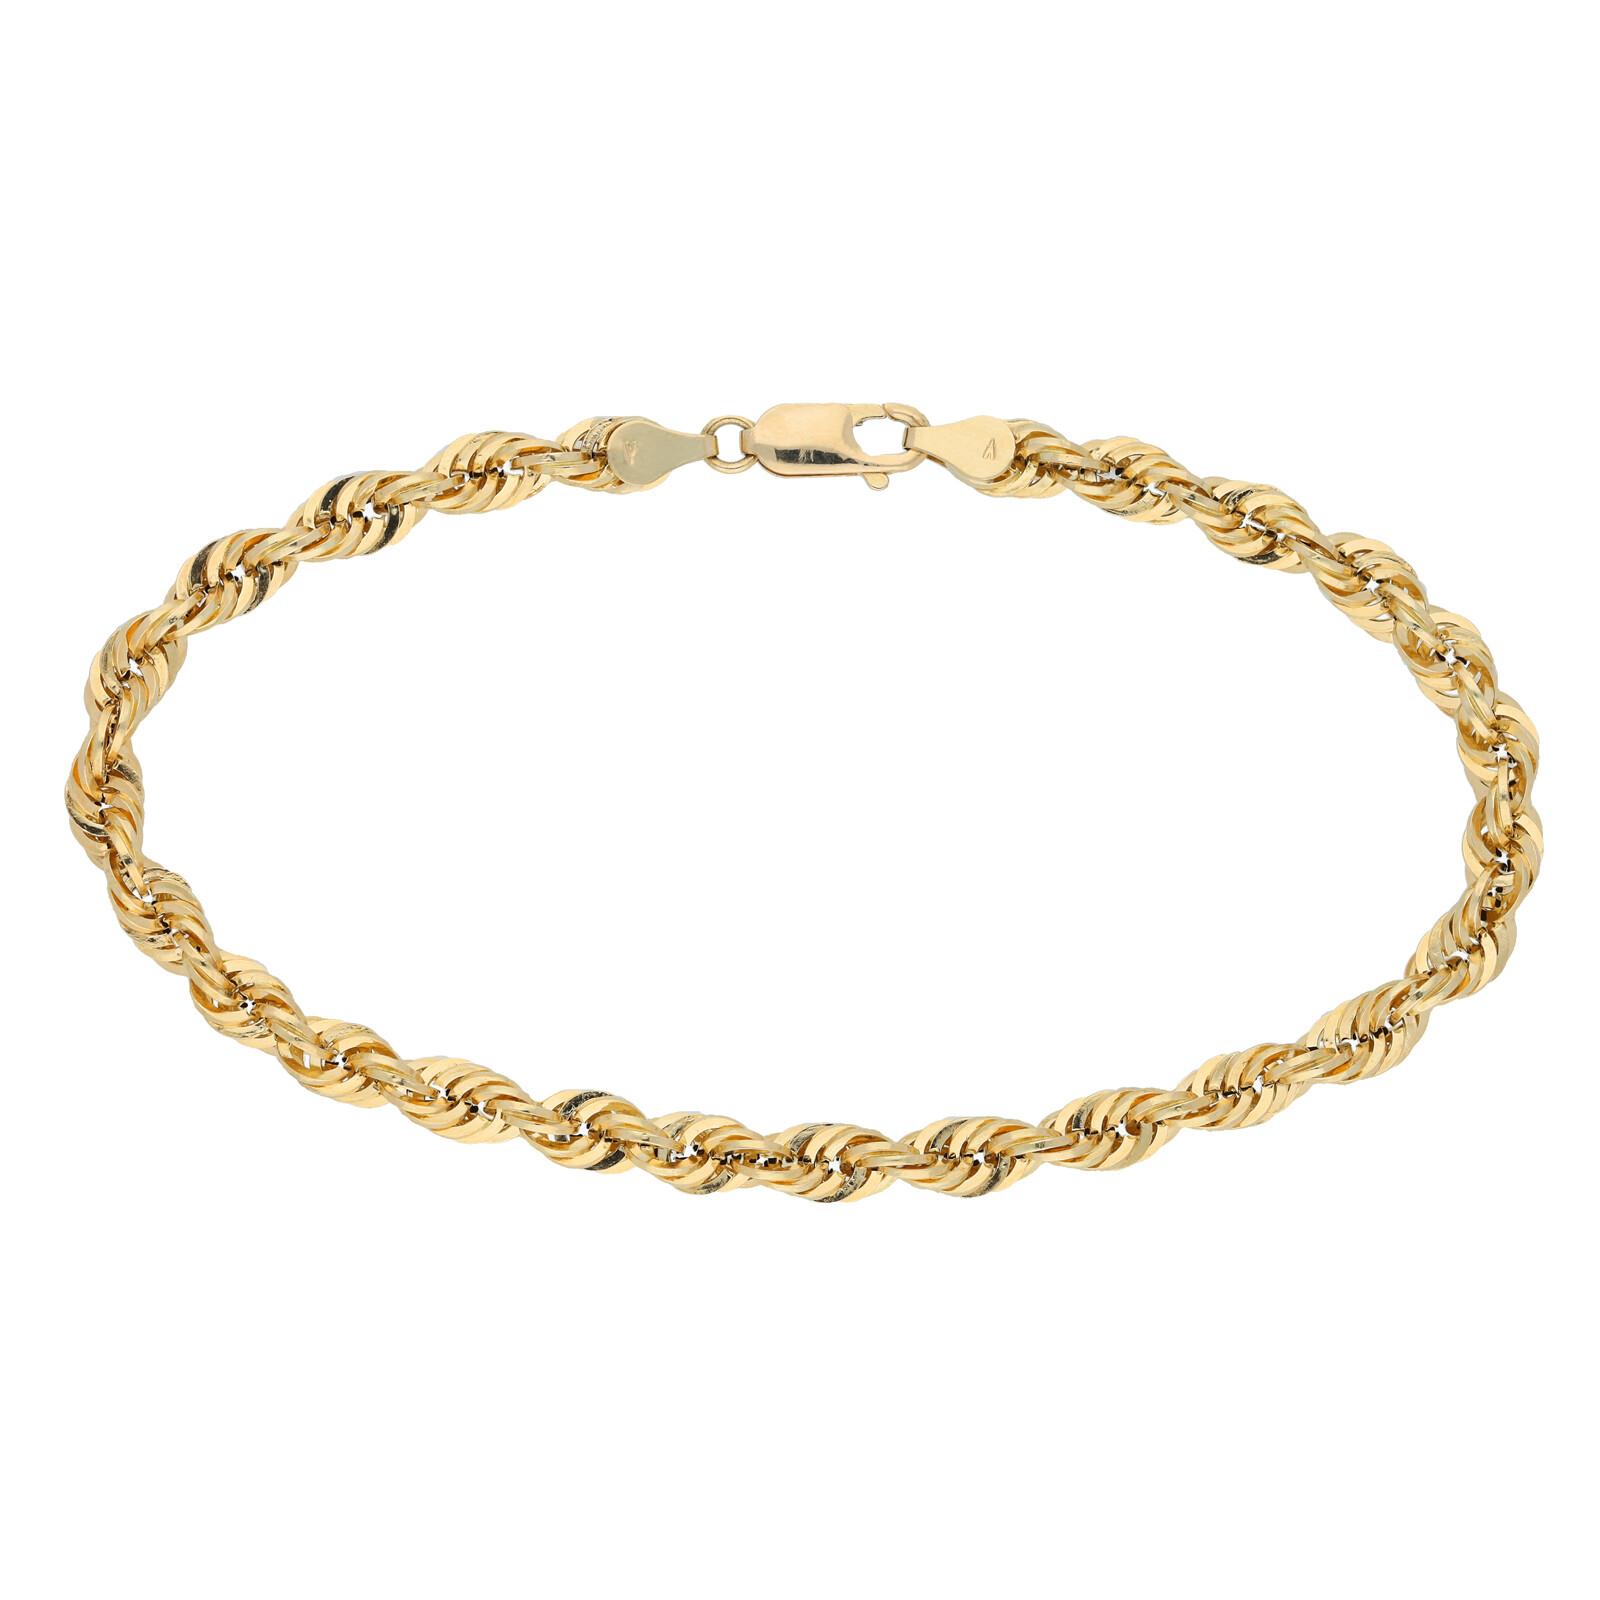 Goldkordelarmband 21cm